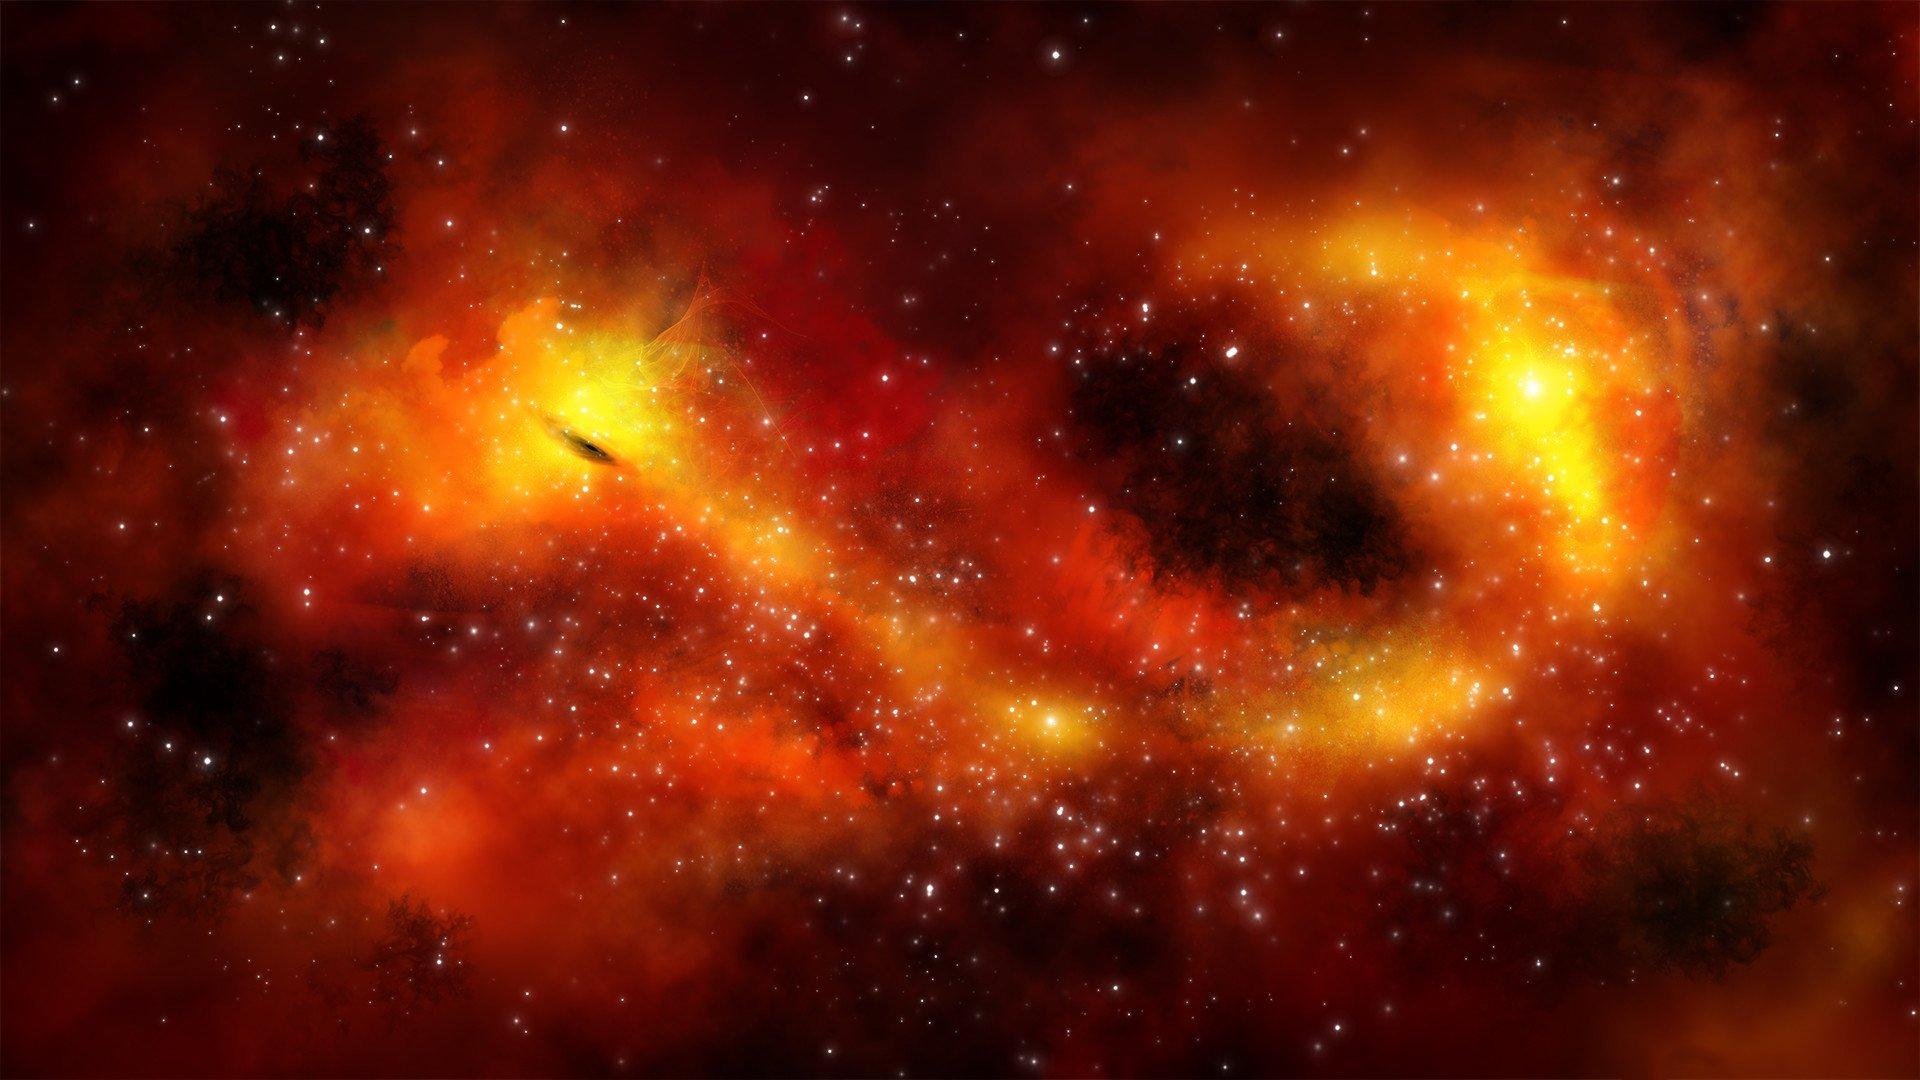 Andromeda Galaxy Wallpaper Iphone Galaxy Hd Wallpaper Background Image 1920x1080 Id